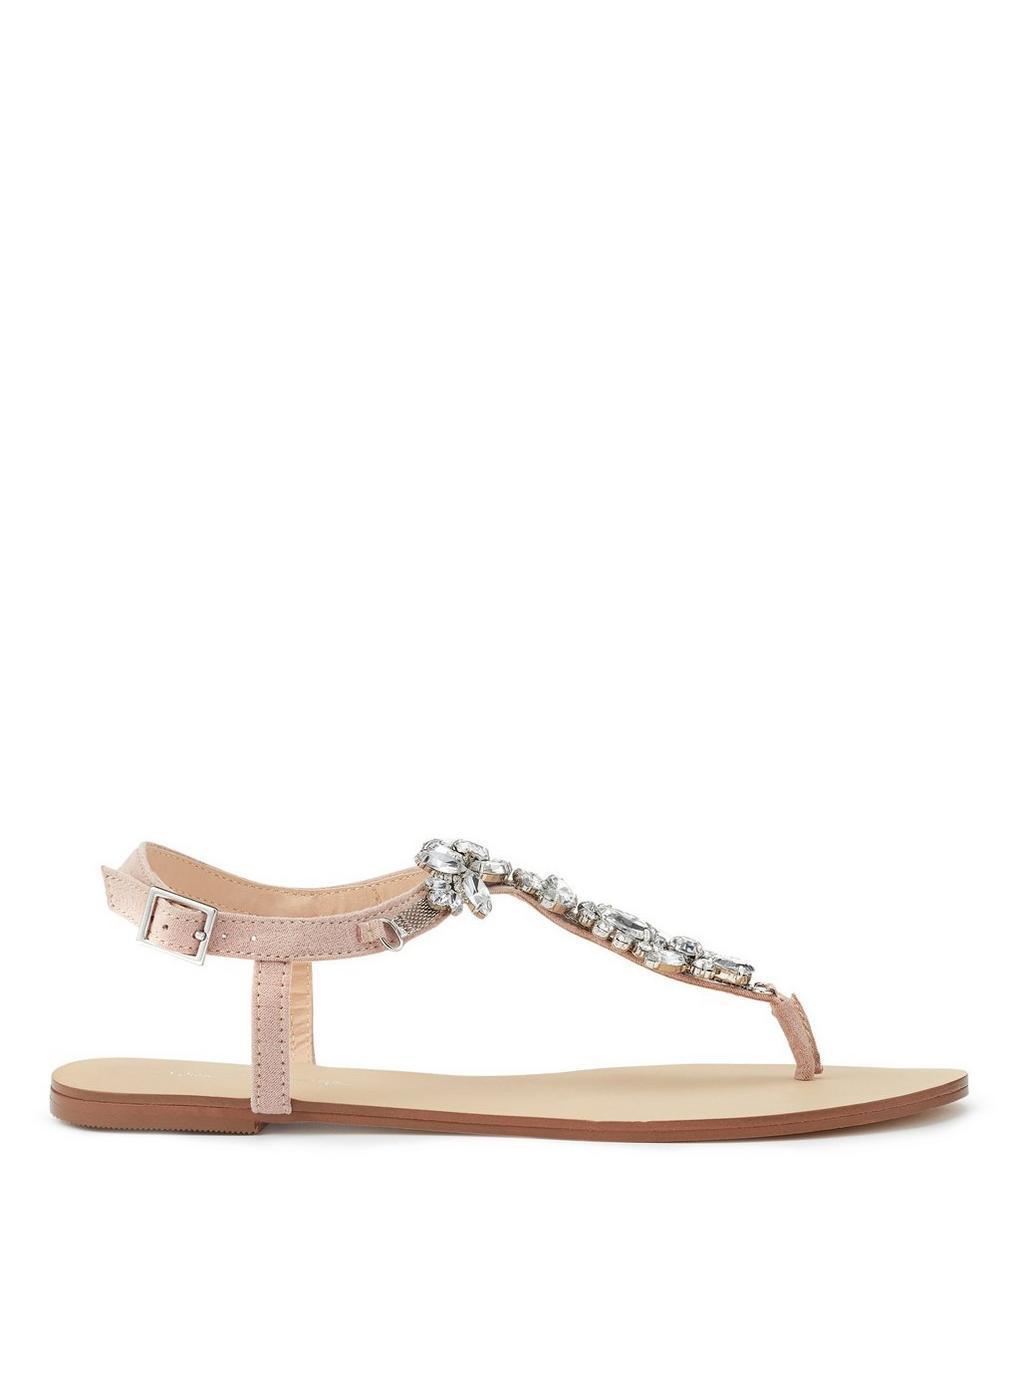 bf8ec60fbf736 Jewelled Flat Sandals - Lyst. View fullscreen most popular 8462f 87482   Fitflop Shimmy Suede Toe-post ...